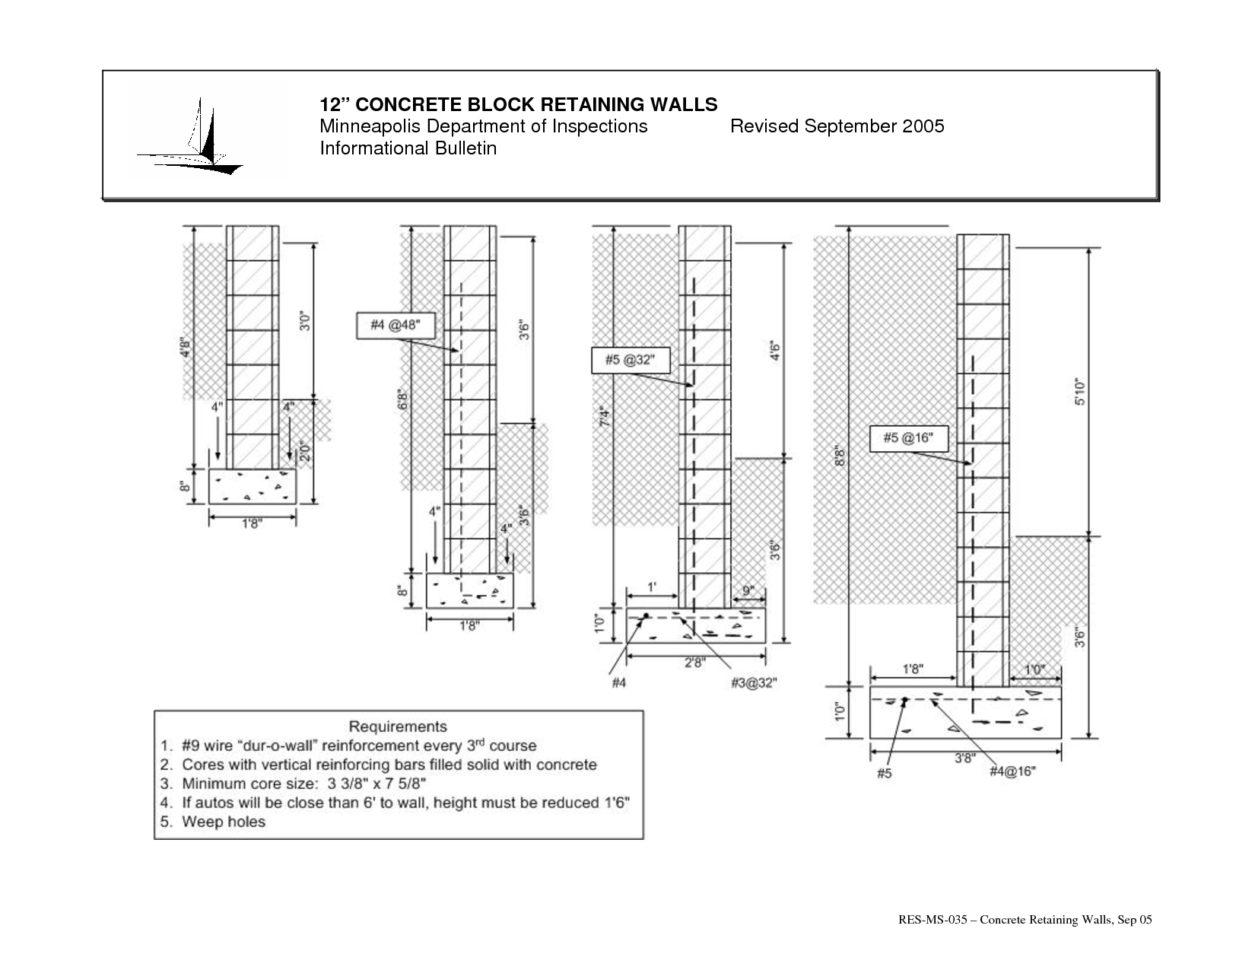 Masonry Wall Design Spreadsheet Regarding Retaining Wall Design Spreadsheet Masonry Retaining Wall Design